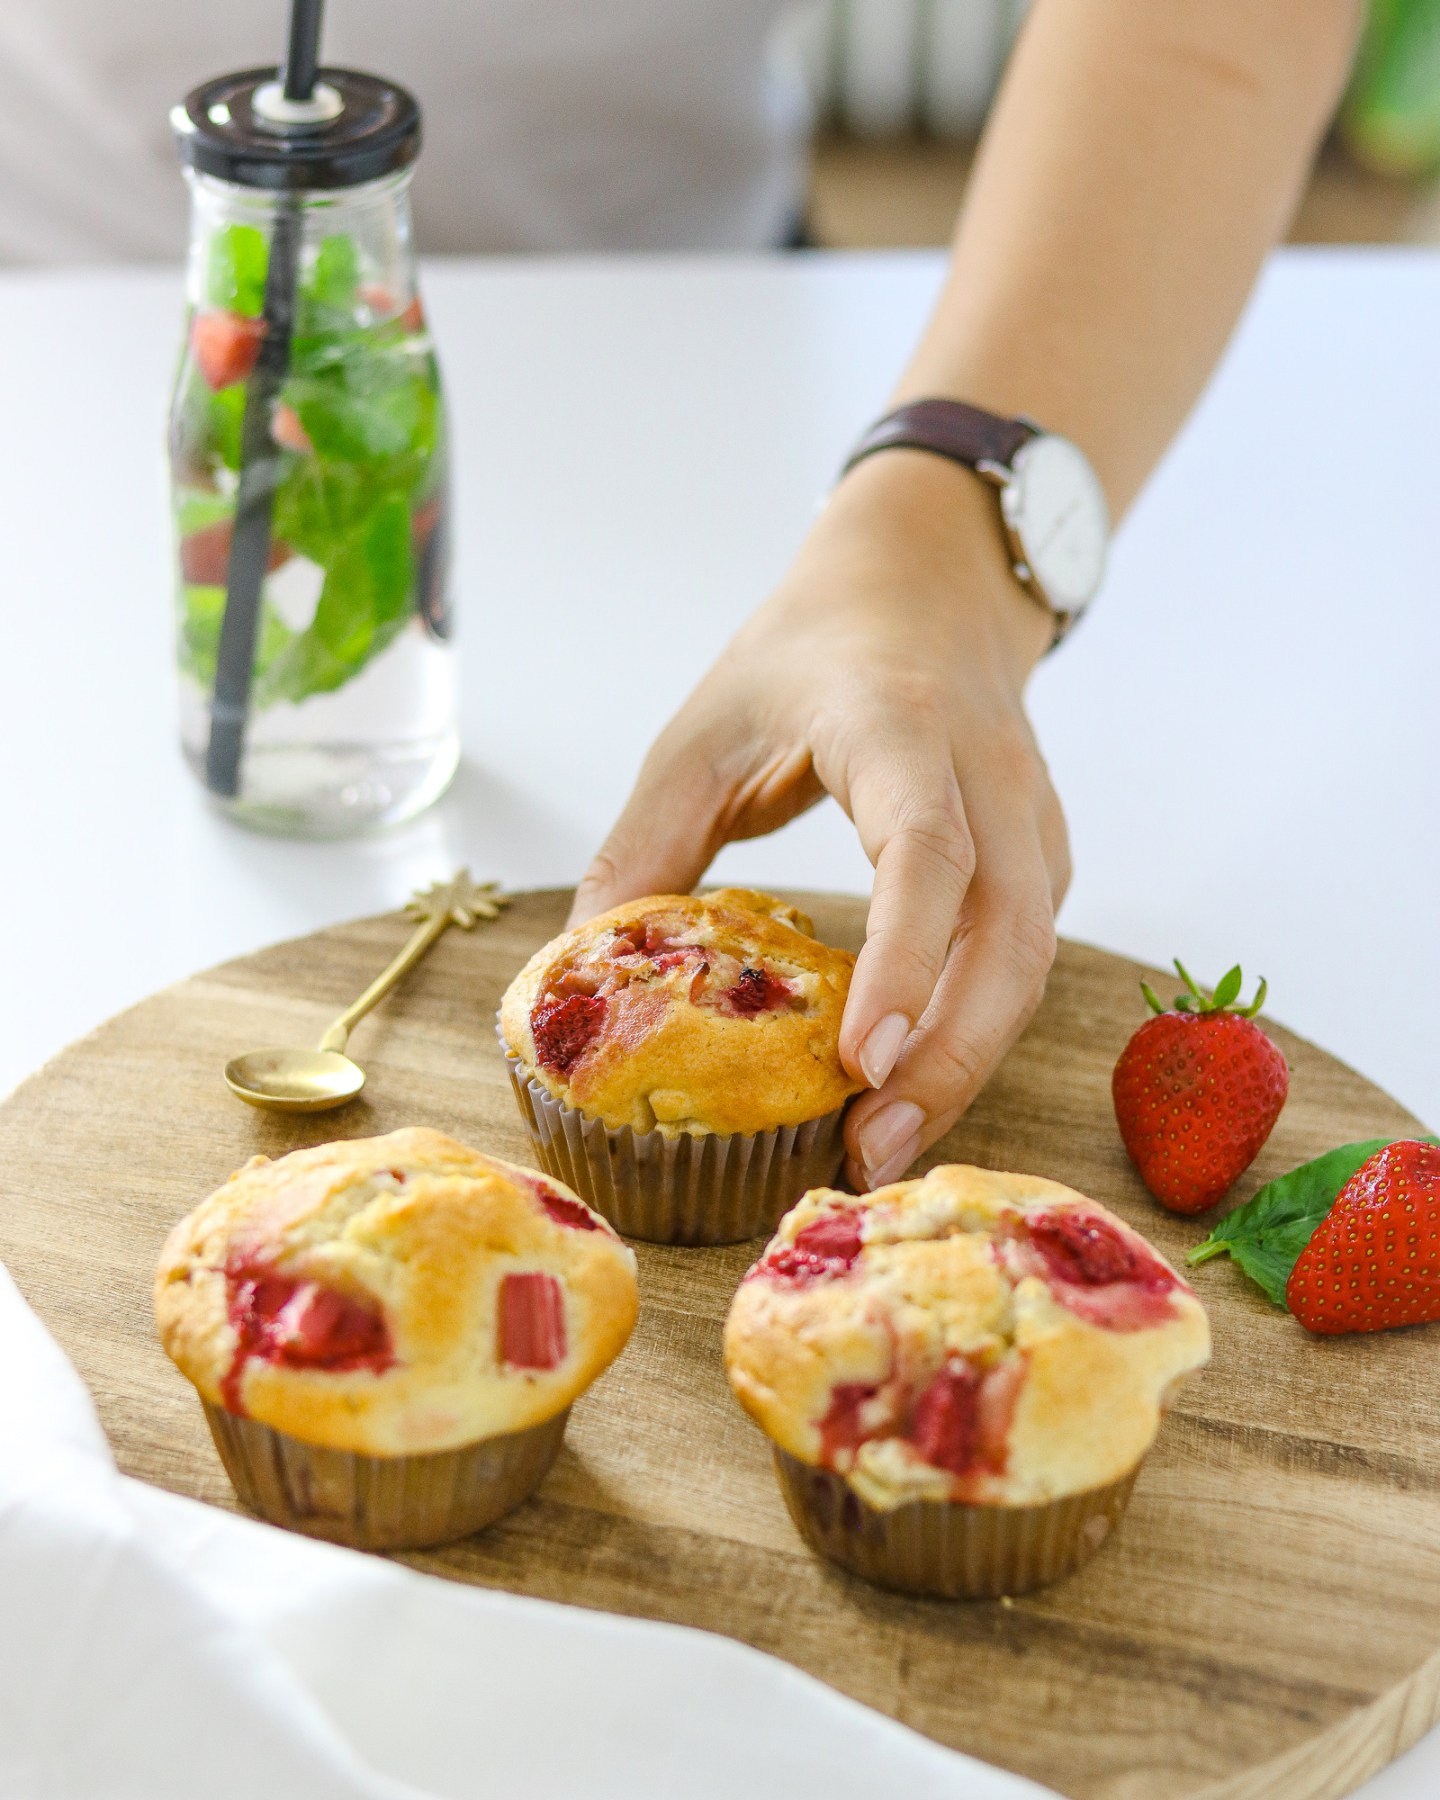 Rhabarber-Erdbeer-Muffins-Bakinglifestories.com